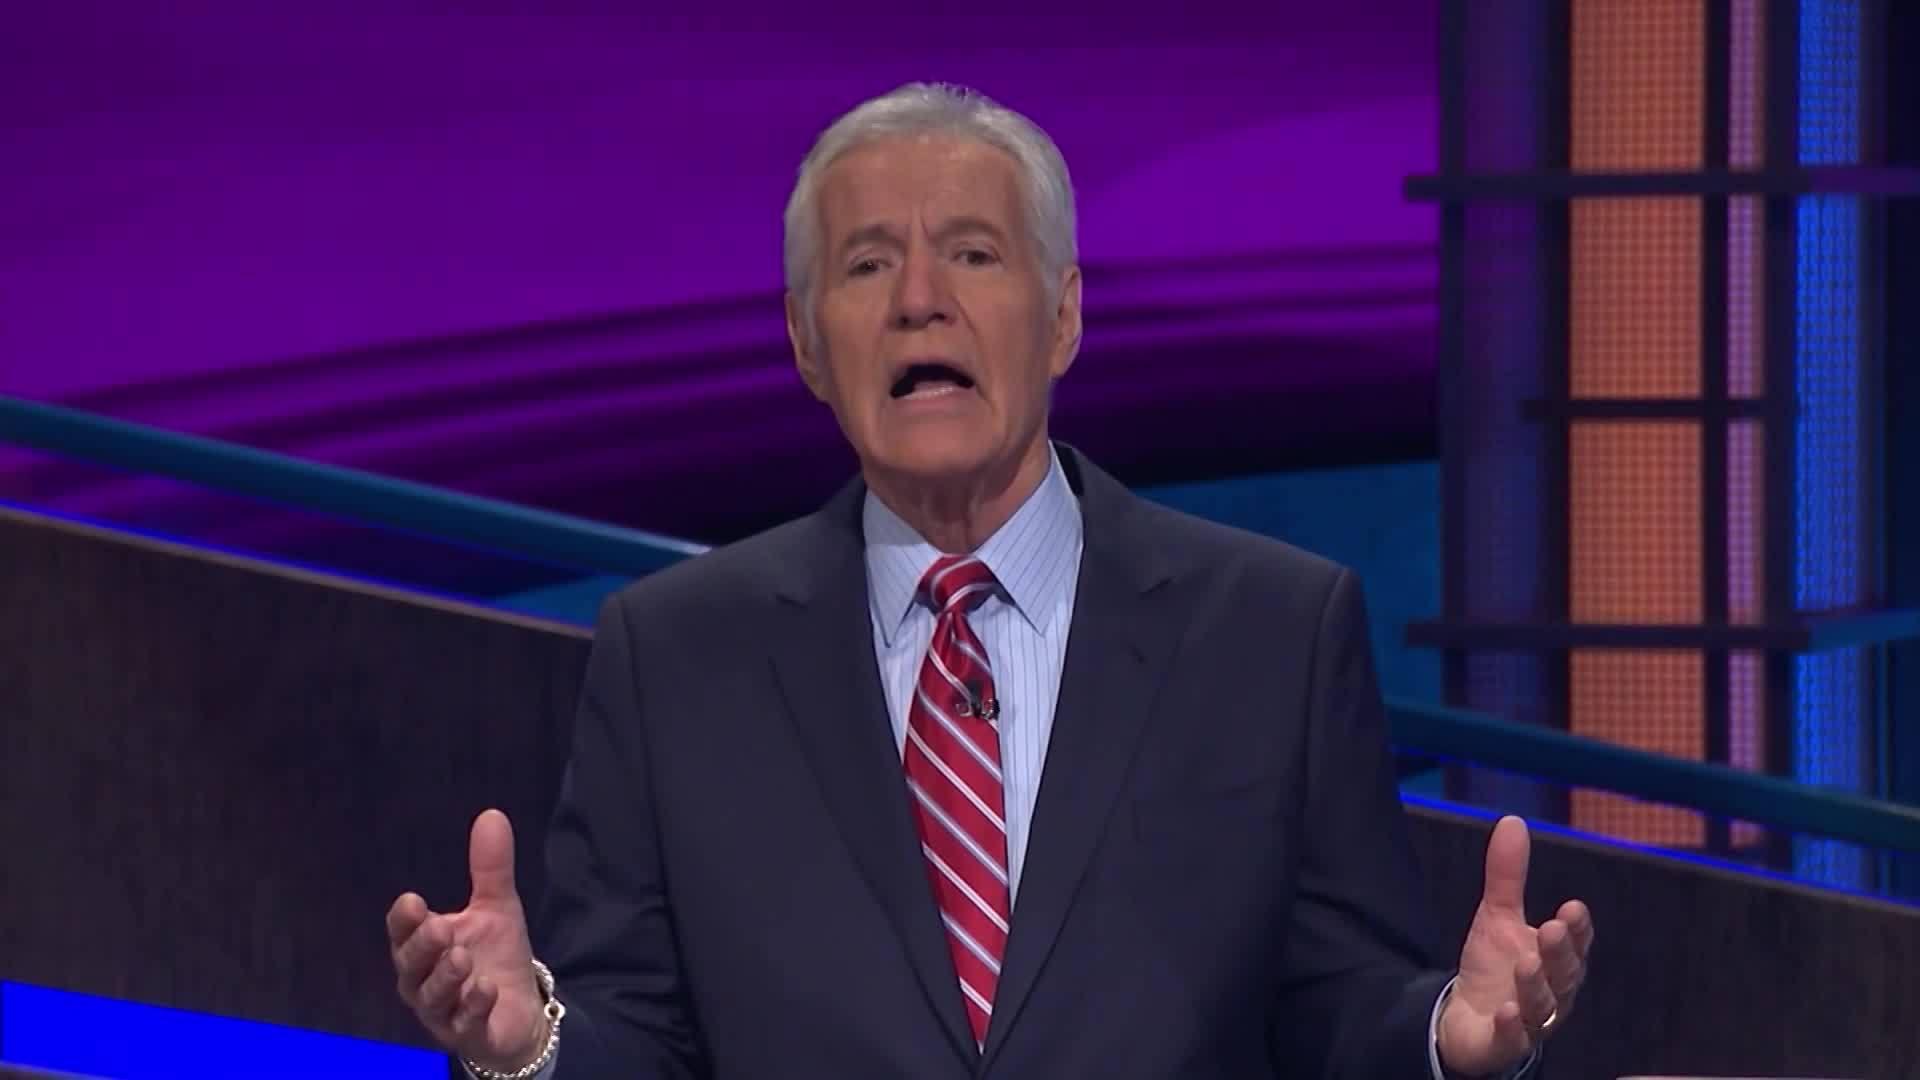 _Jeopardy___host_Alex_Trebek_says_he_has_0_20190307000704